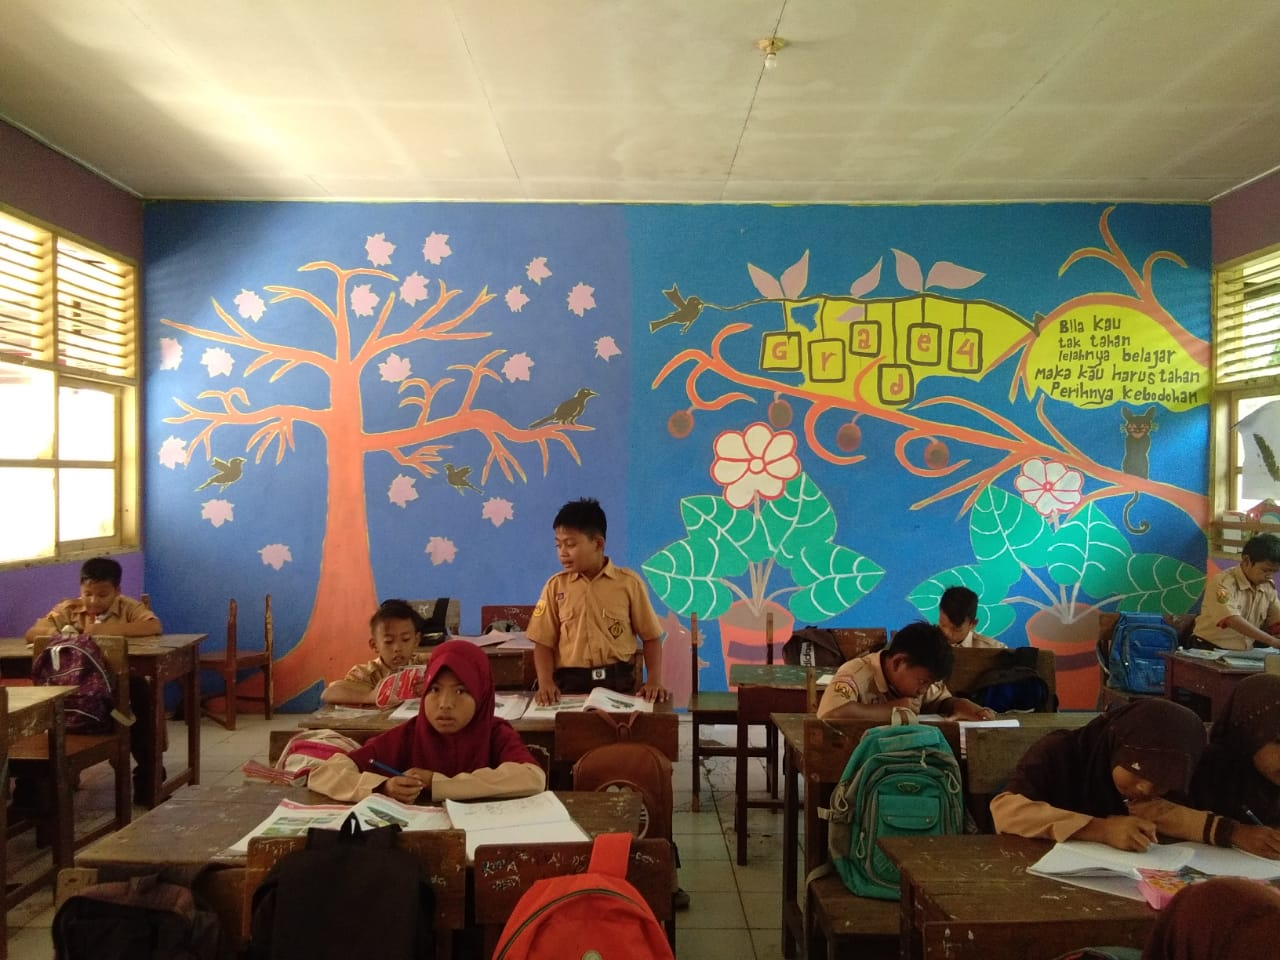 Foto Background Kelas Keren Kelas Kreatif 1280x960 Wallpaper Teahub Io